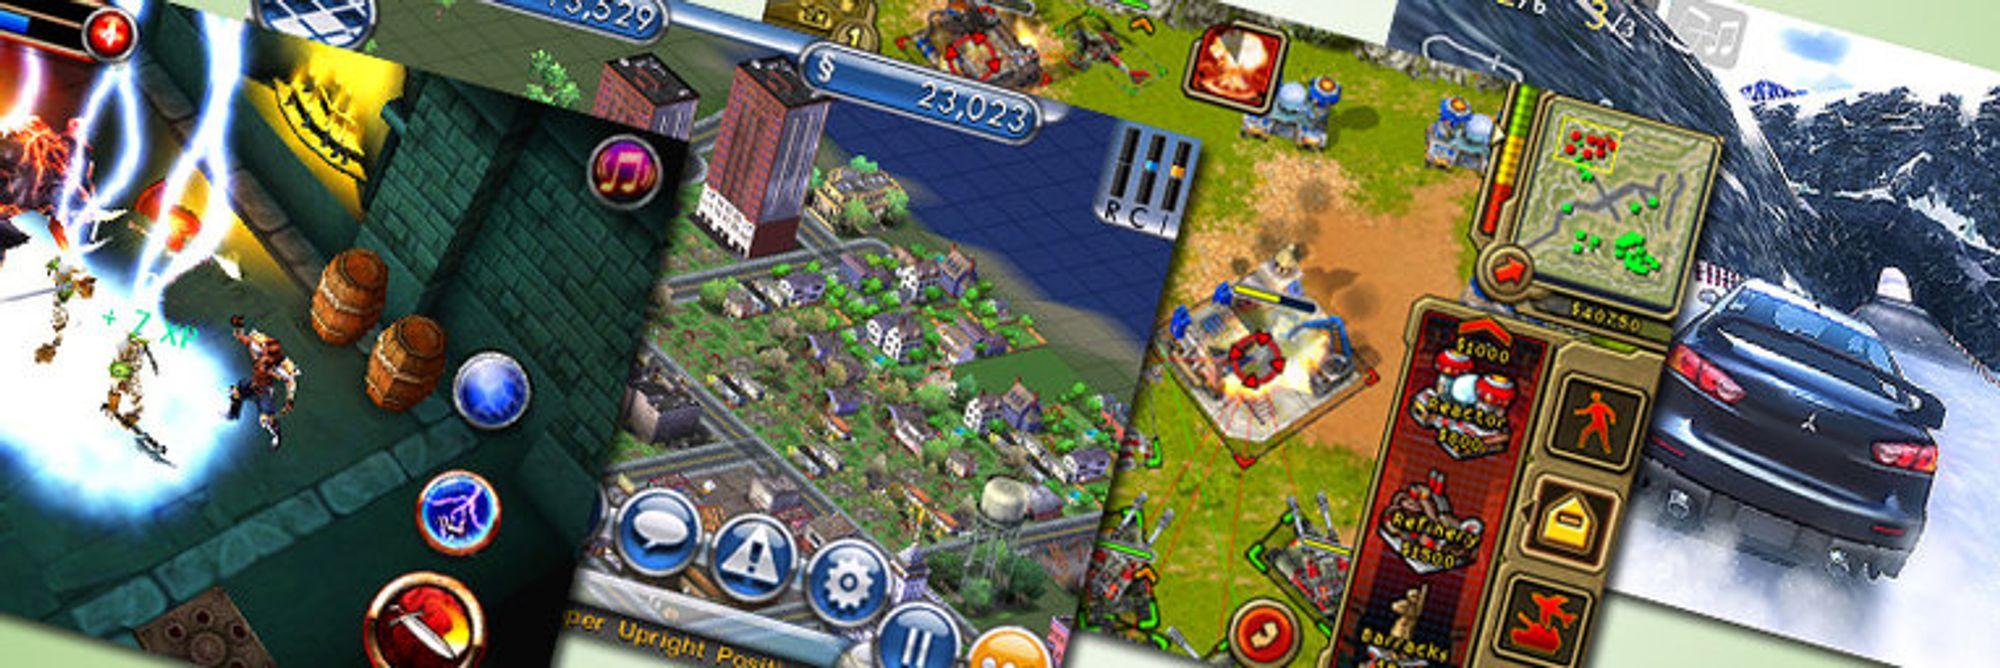 Borderlands 2 multiplayer matchmaking Ayia Napa dating